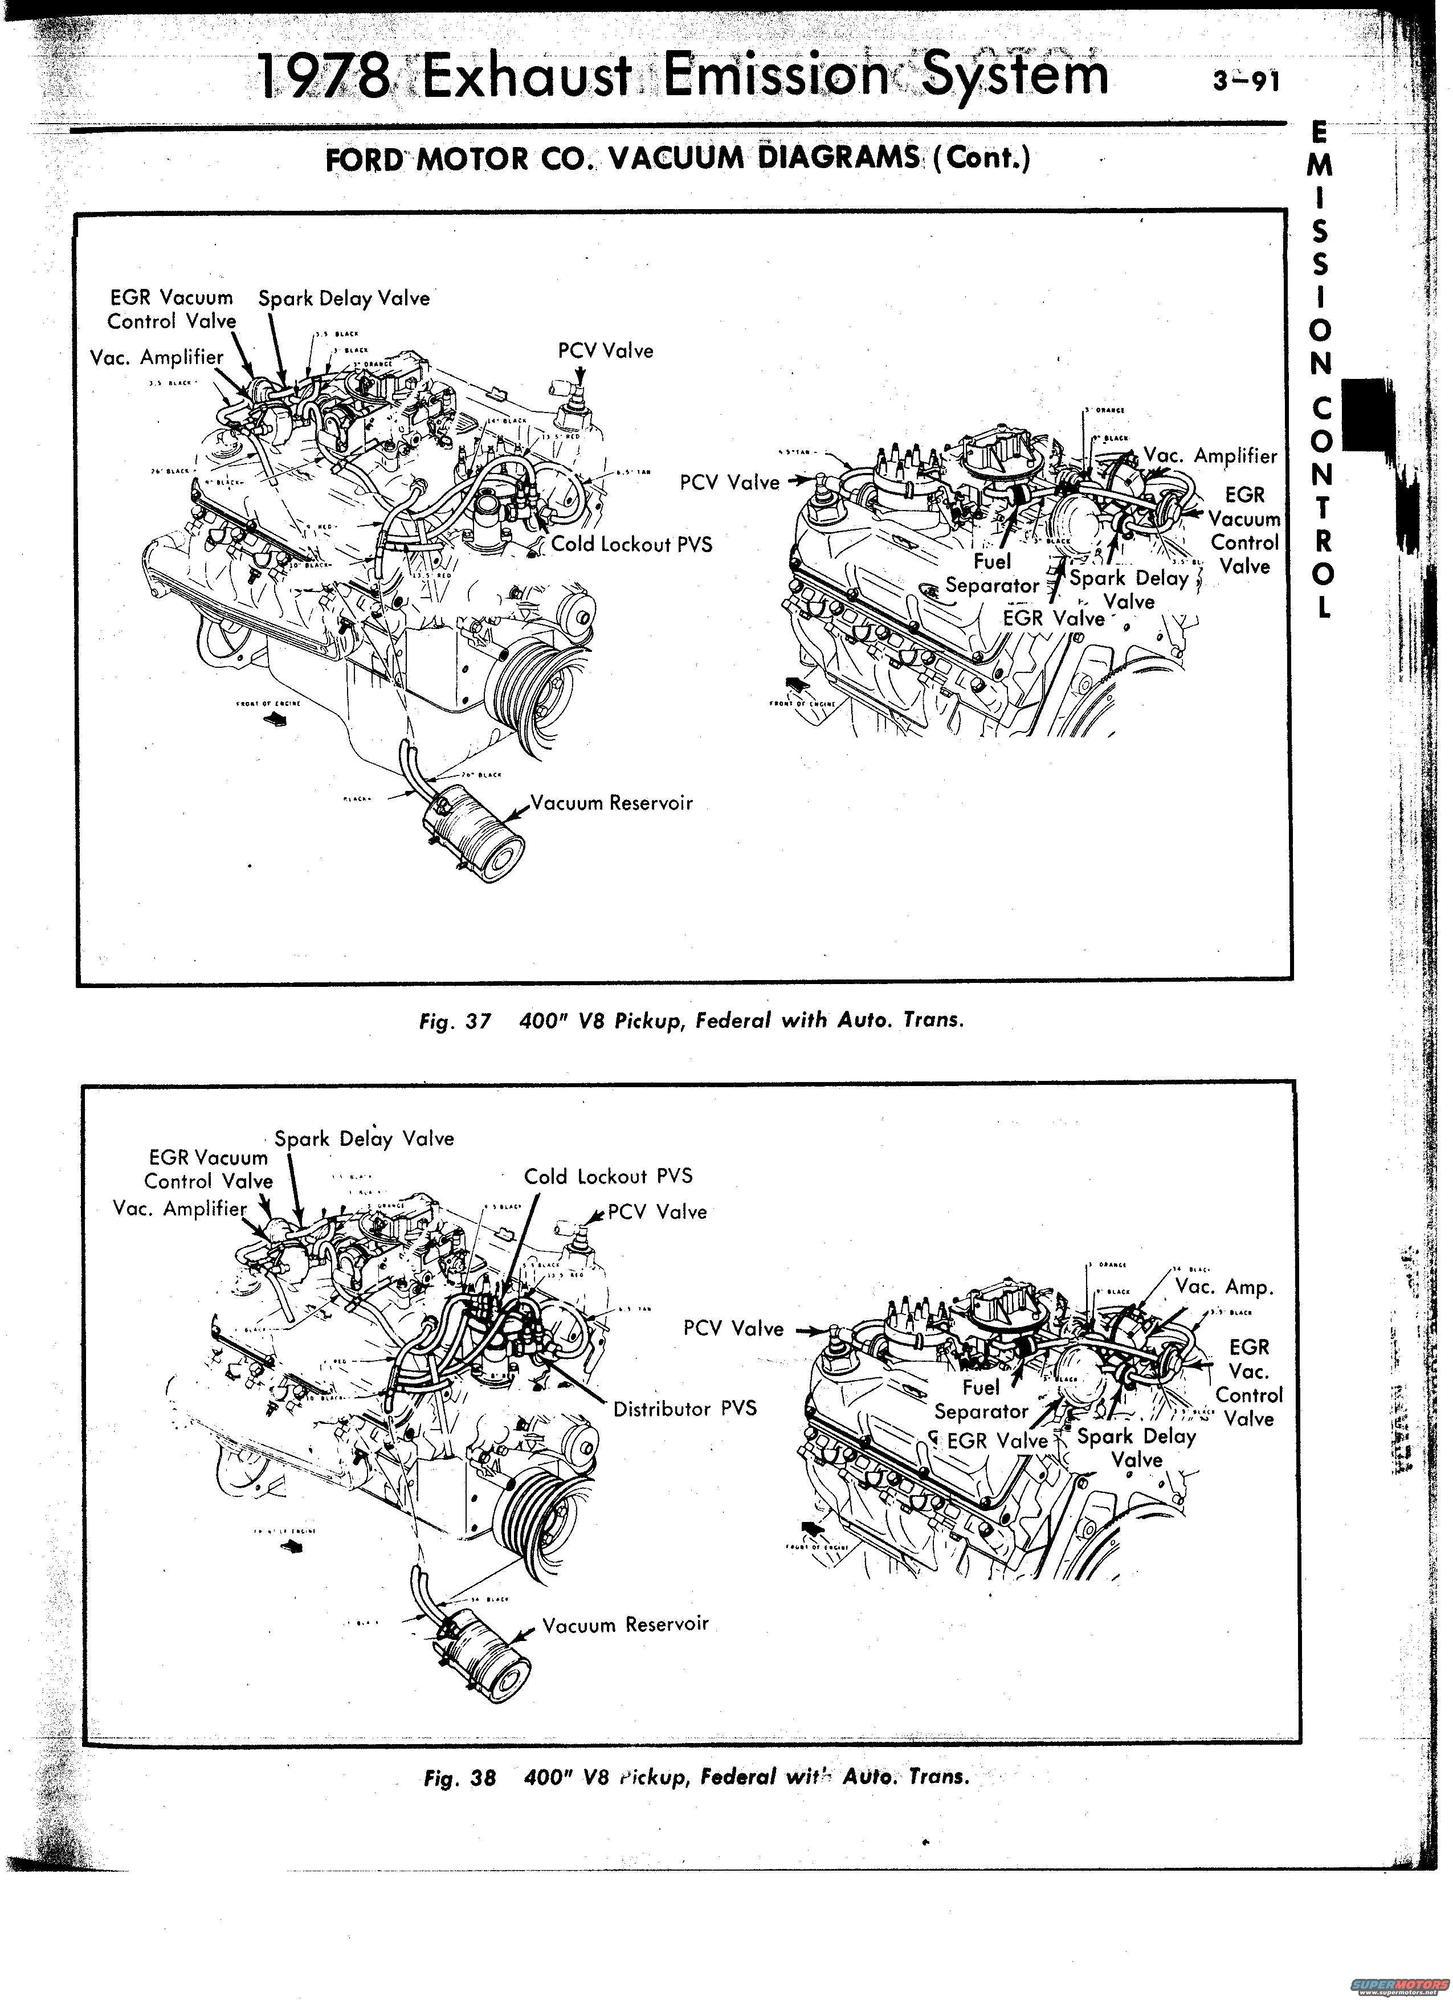 1978 Ford Bronco Vacuum Diagrams